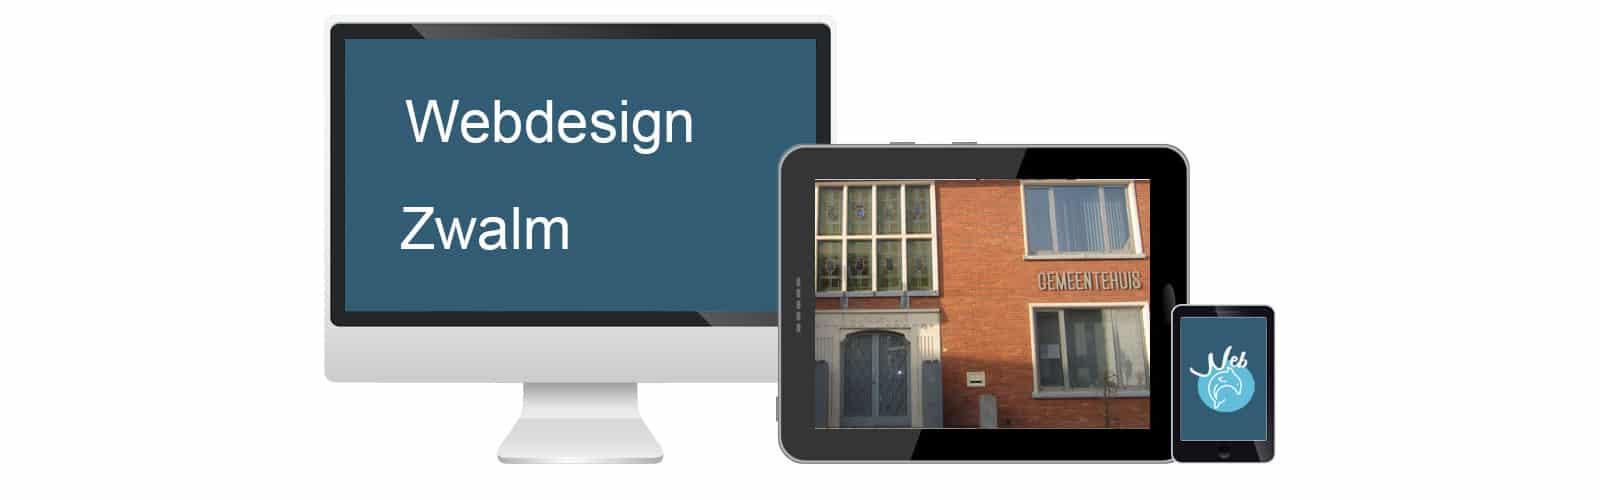 Webdesign Zwalm - webdolfijn